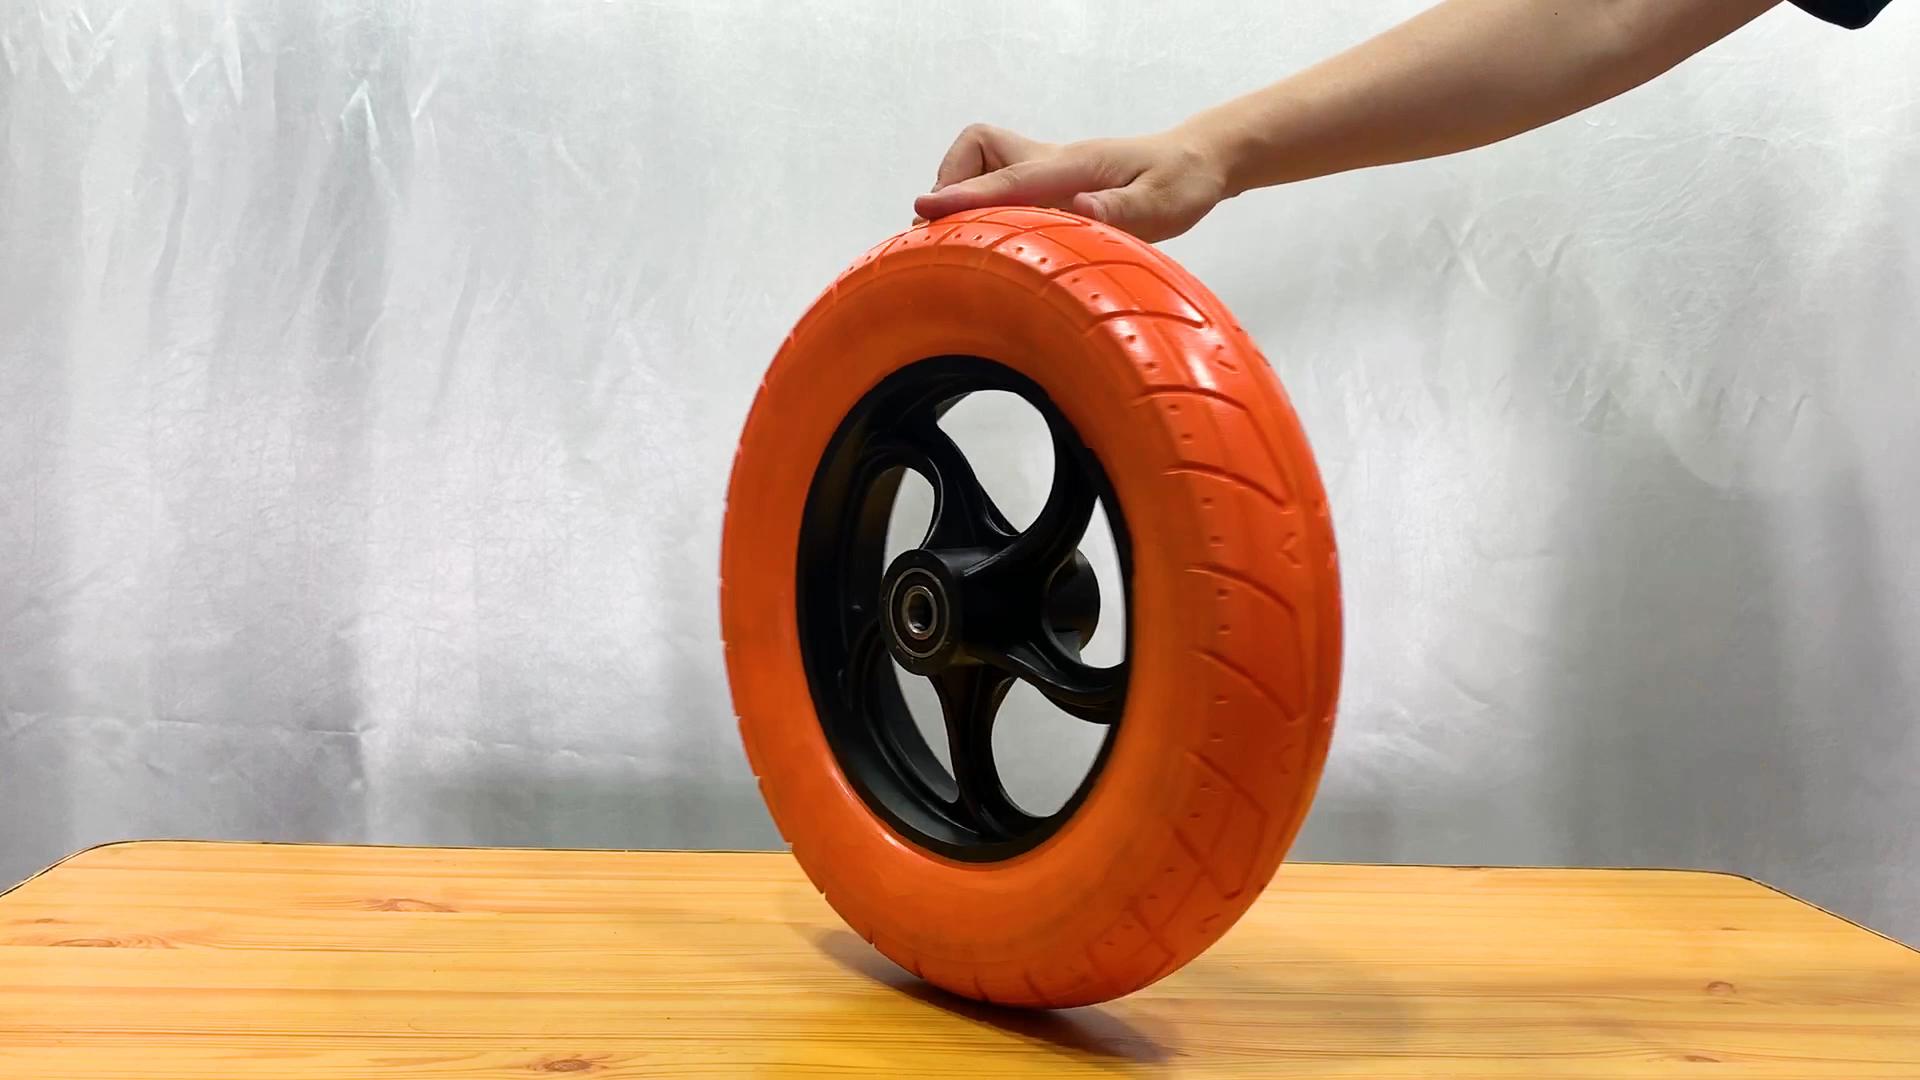 Alibaba Fornecedor China heavy duty rodízio do plutônio roda de espuma